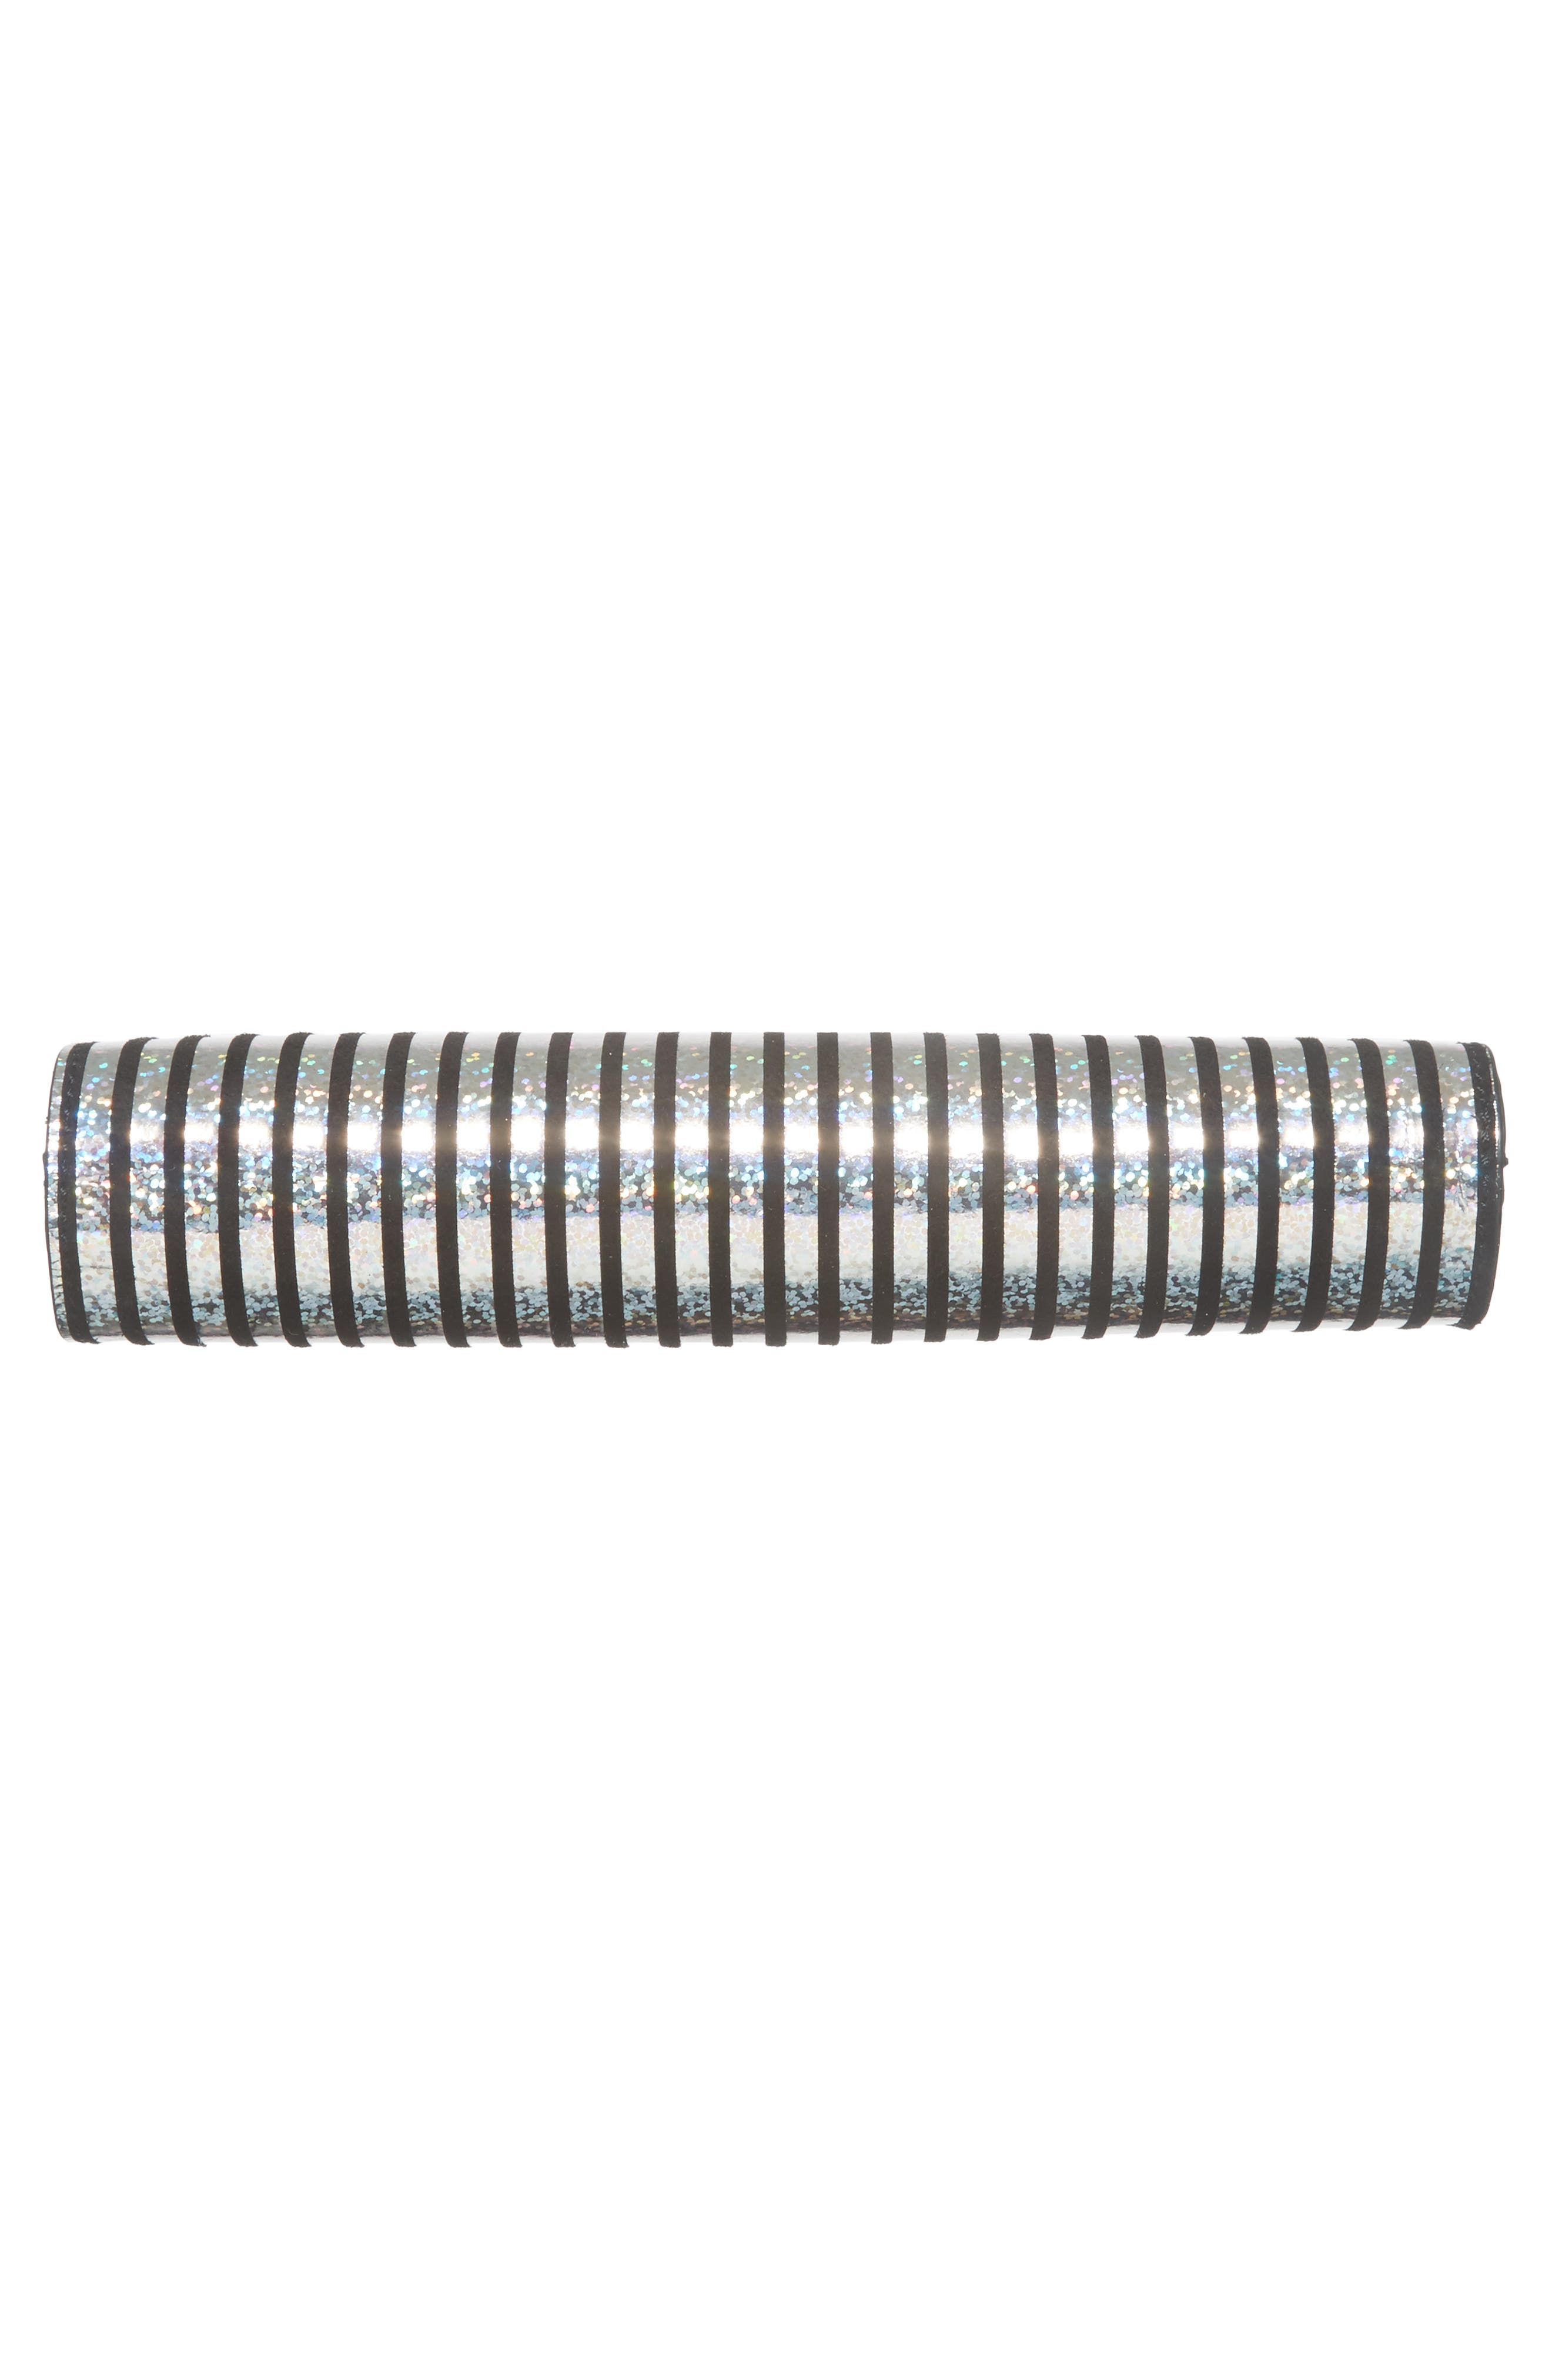 Small Metallic Stripe Frame Clutch,                             Alternate thumbnail 6, color,                             041